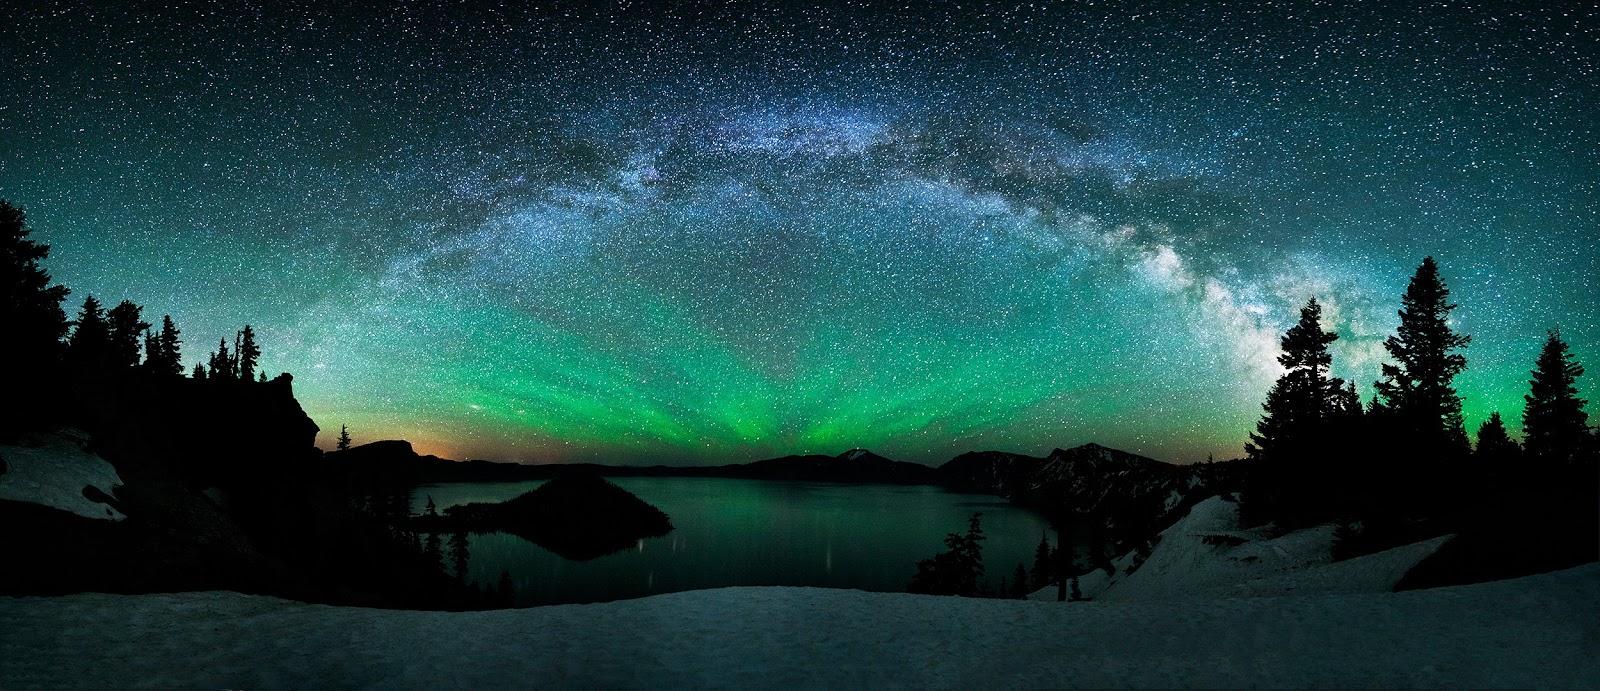 Milky Way Galaxy Crater Lake